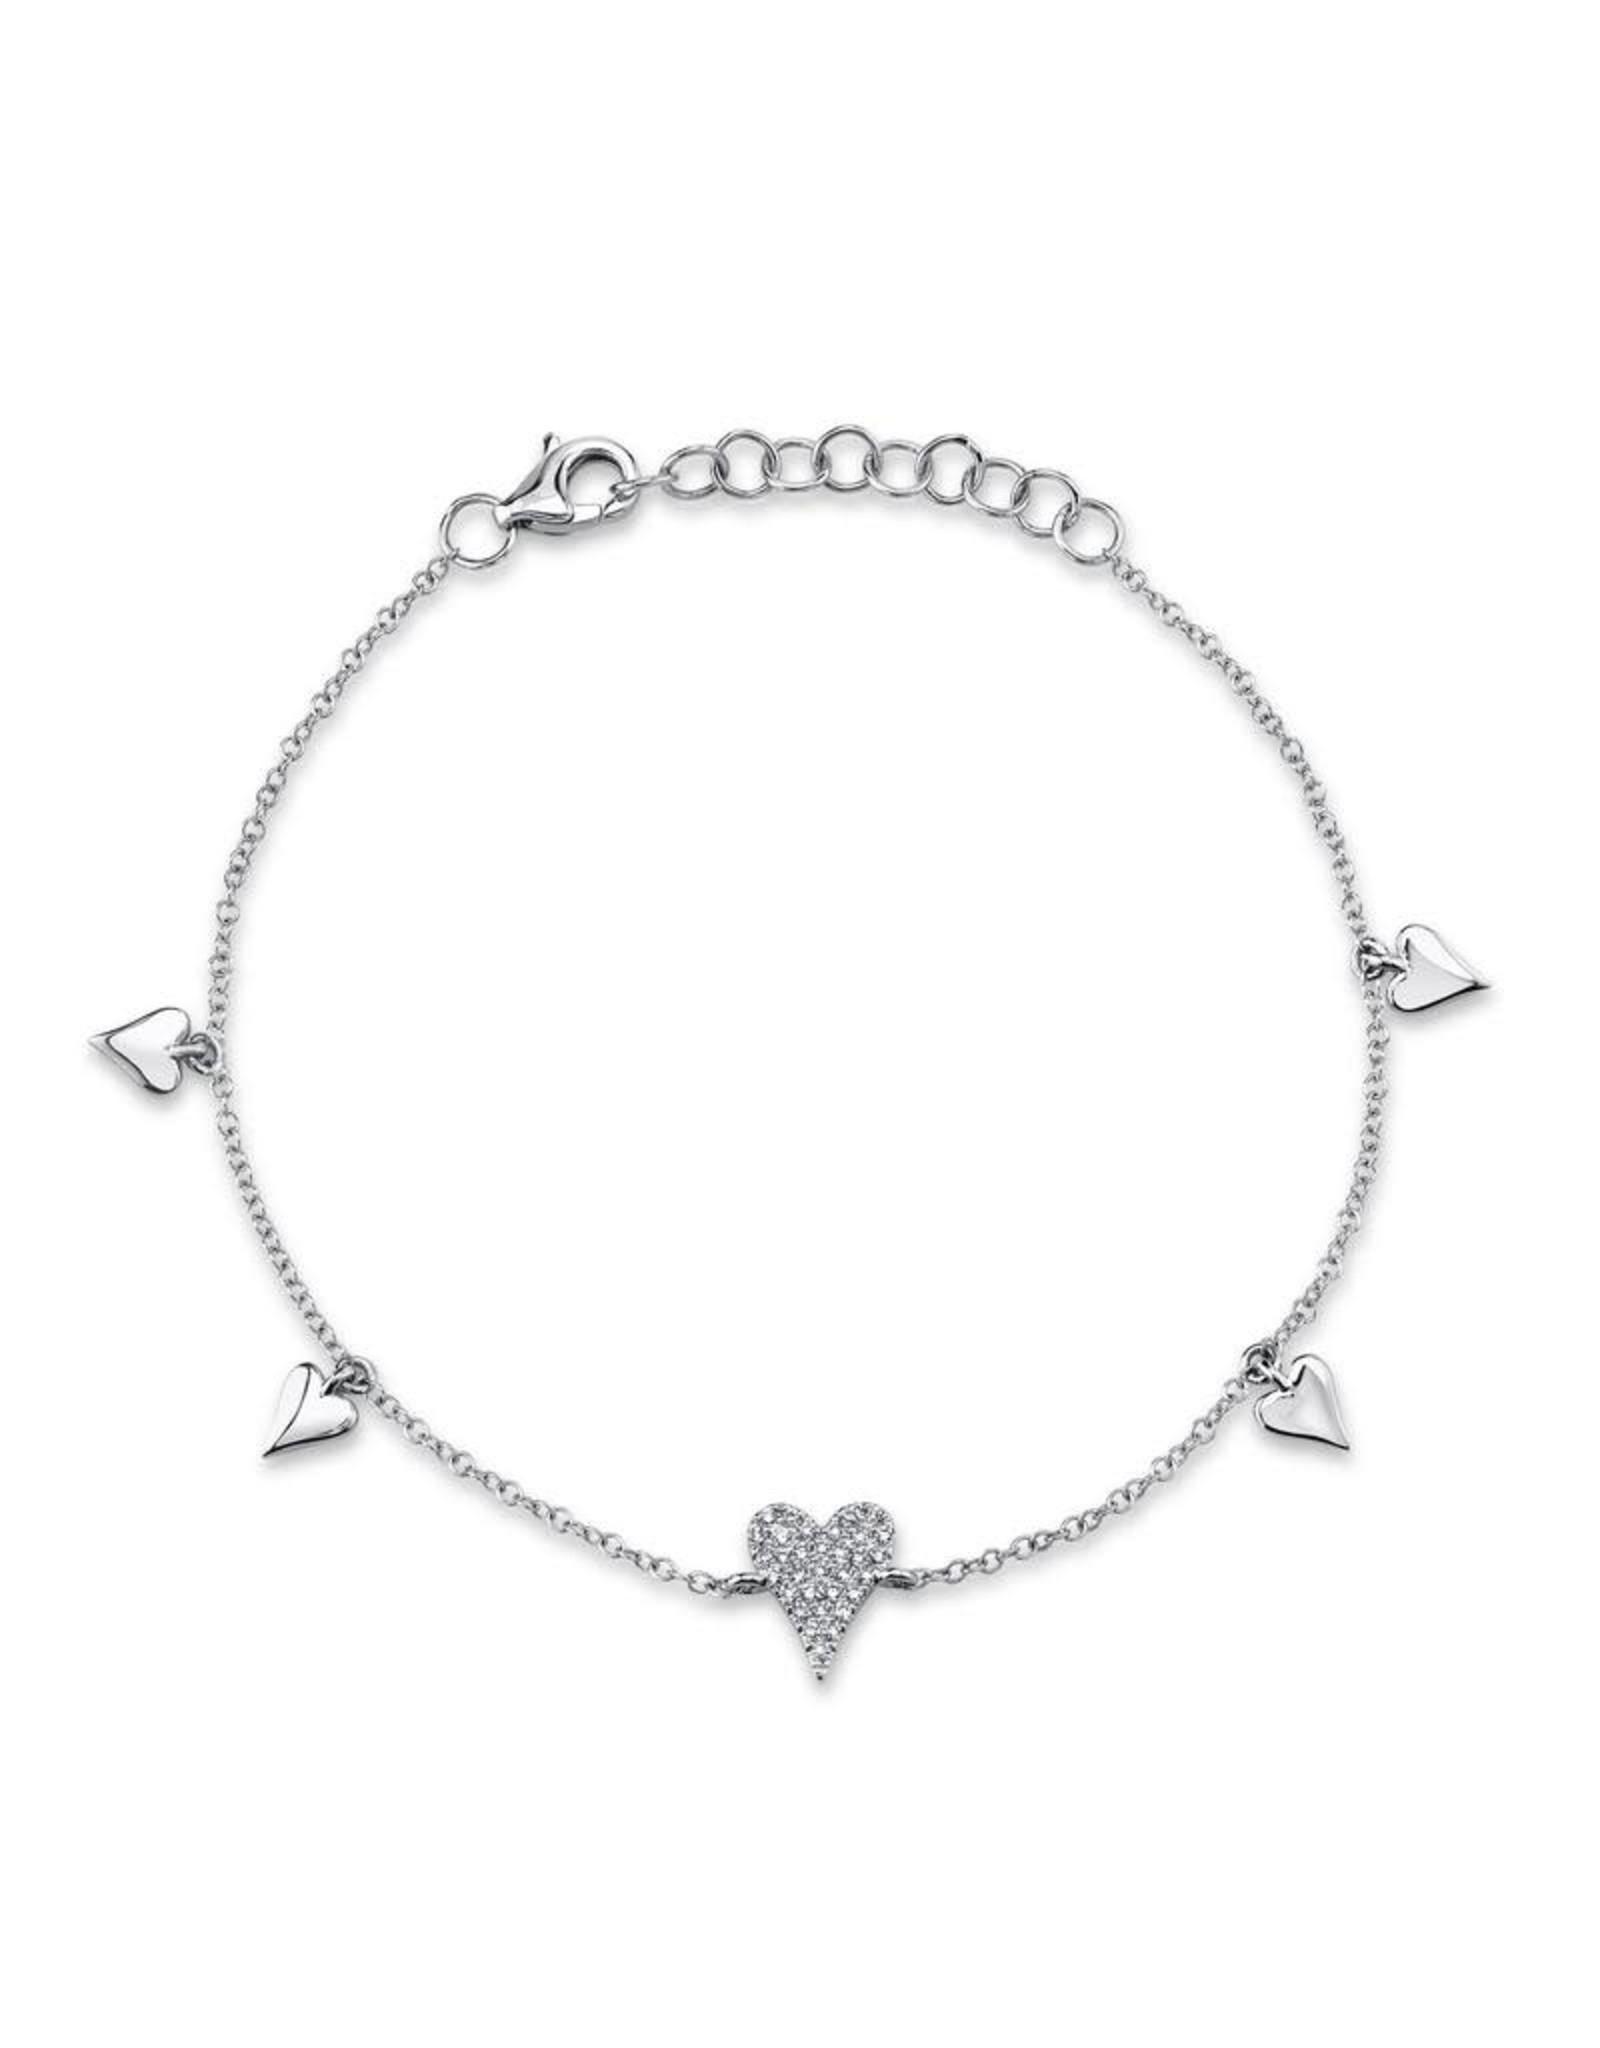 14K White Gold Dainty Pave Diamond Heart Charm Bracelet, D: 0.08ct